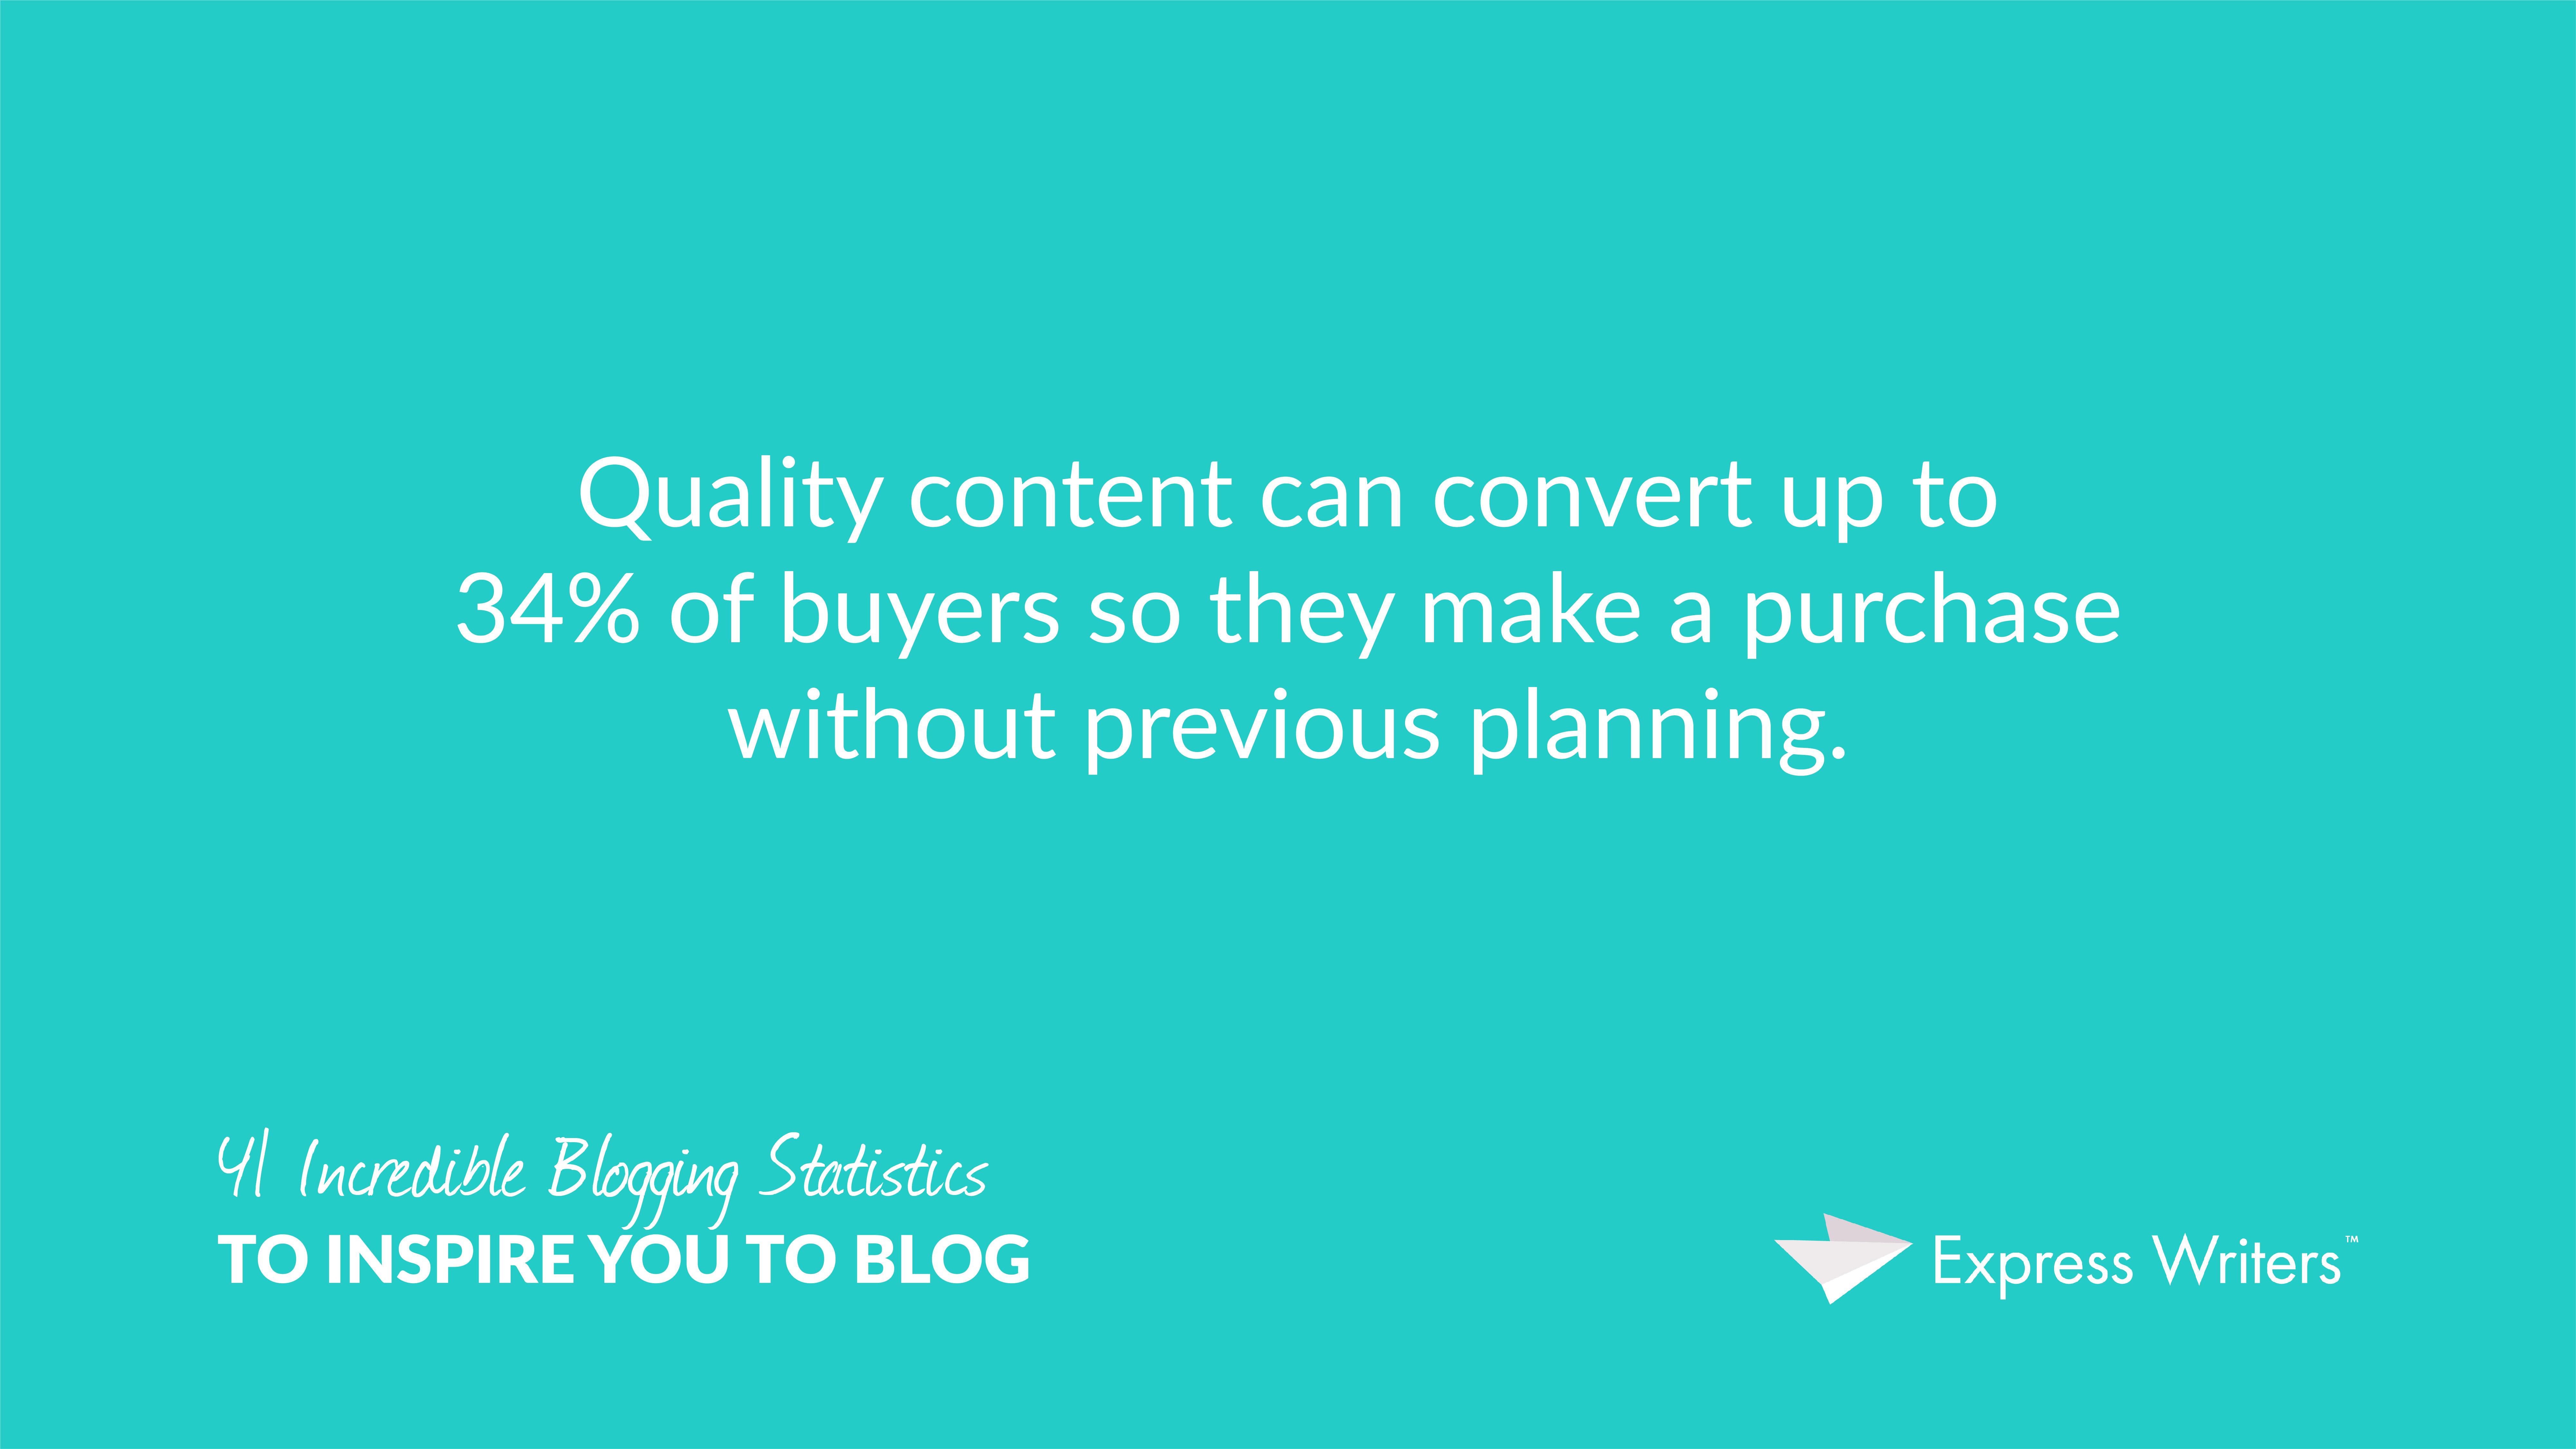 Quality content converts